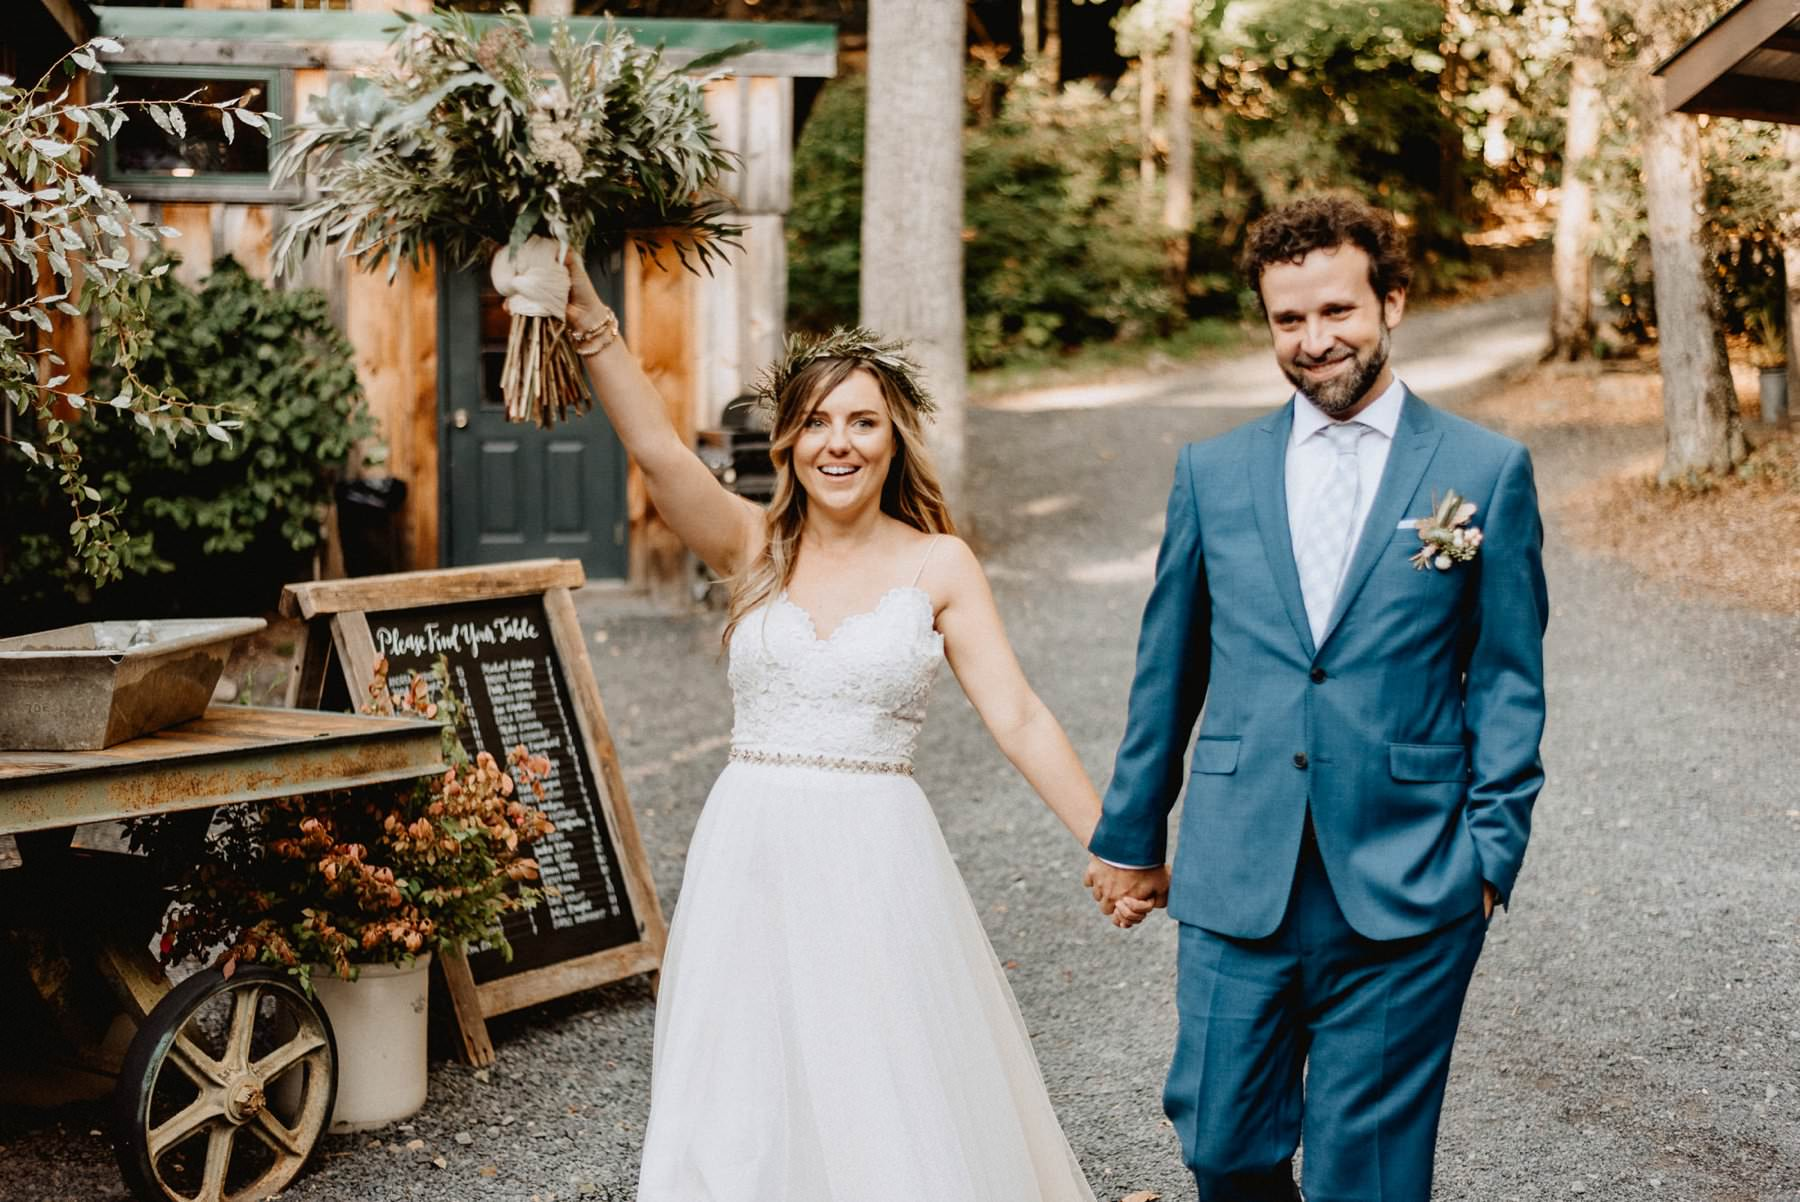 055-Tall-timber-barn-wedding-66.jpg